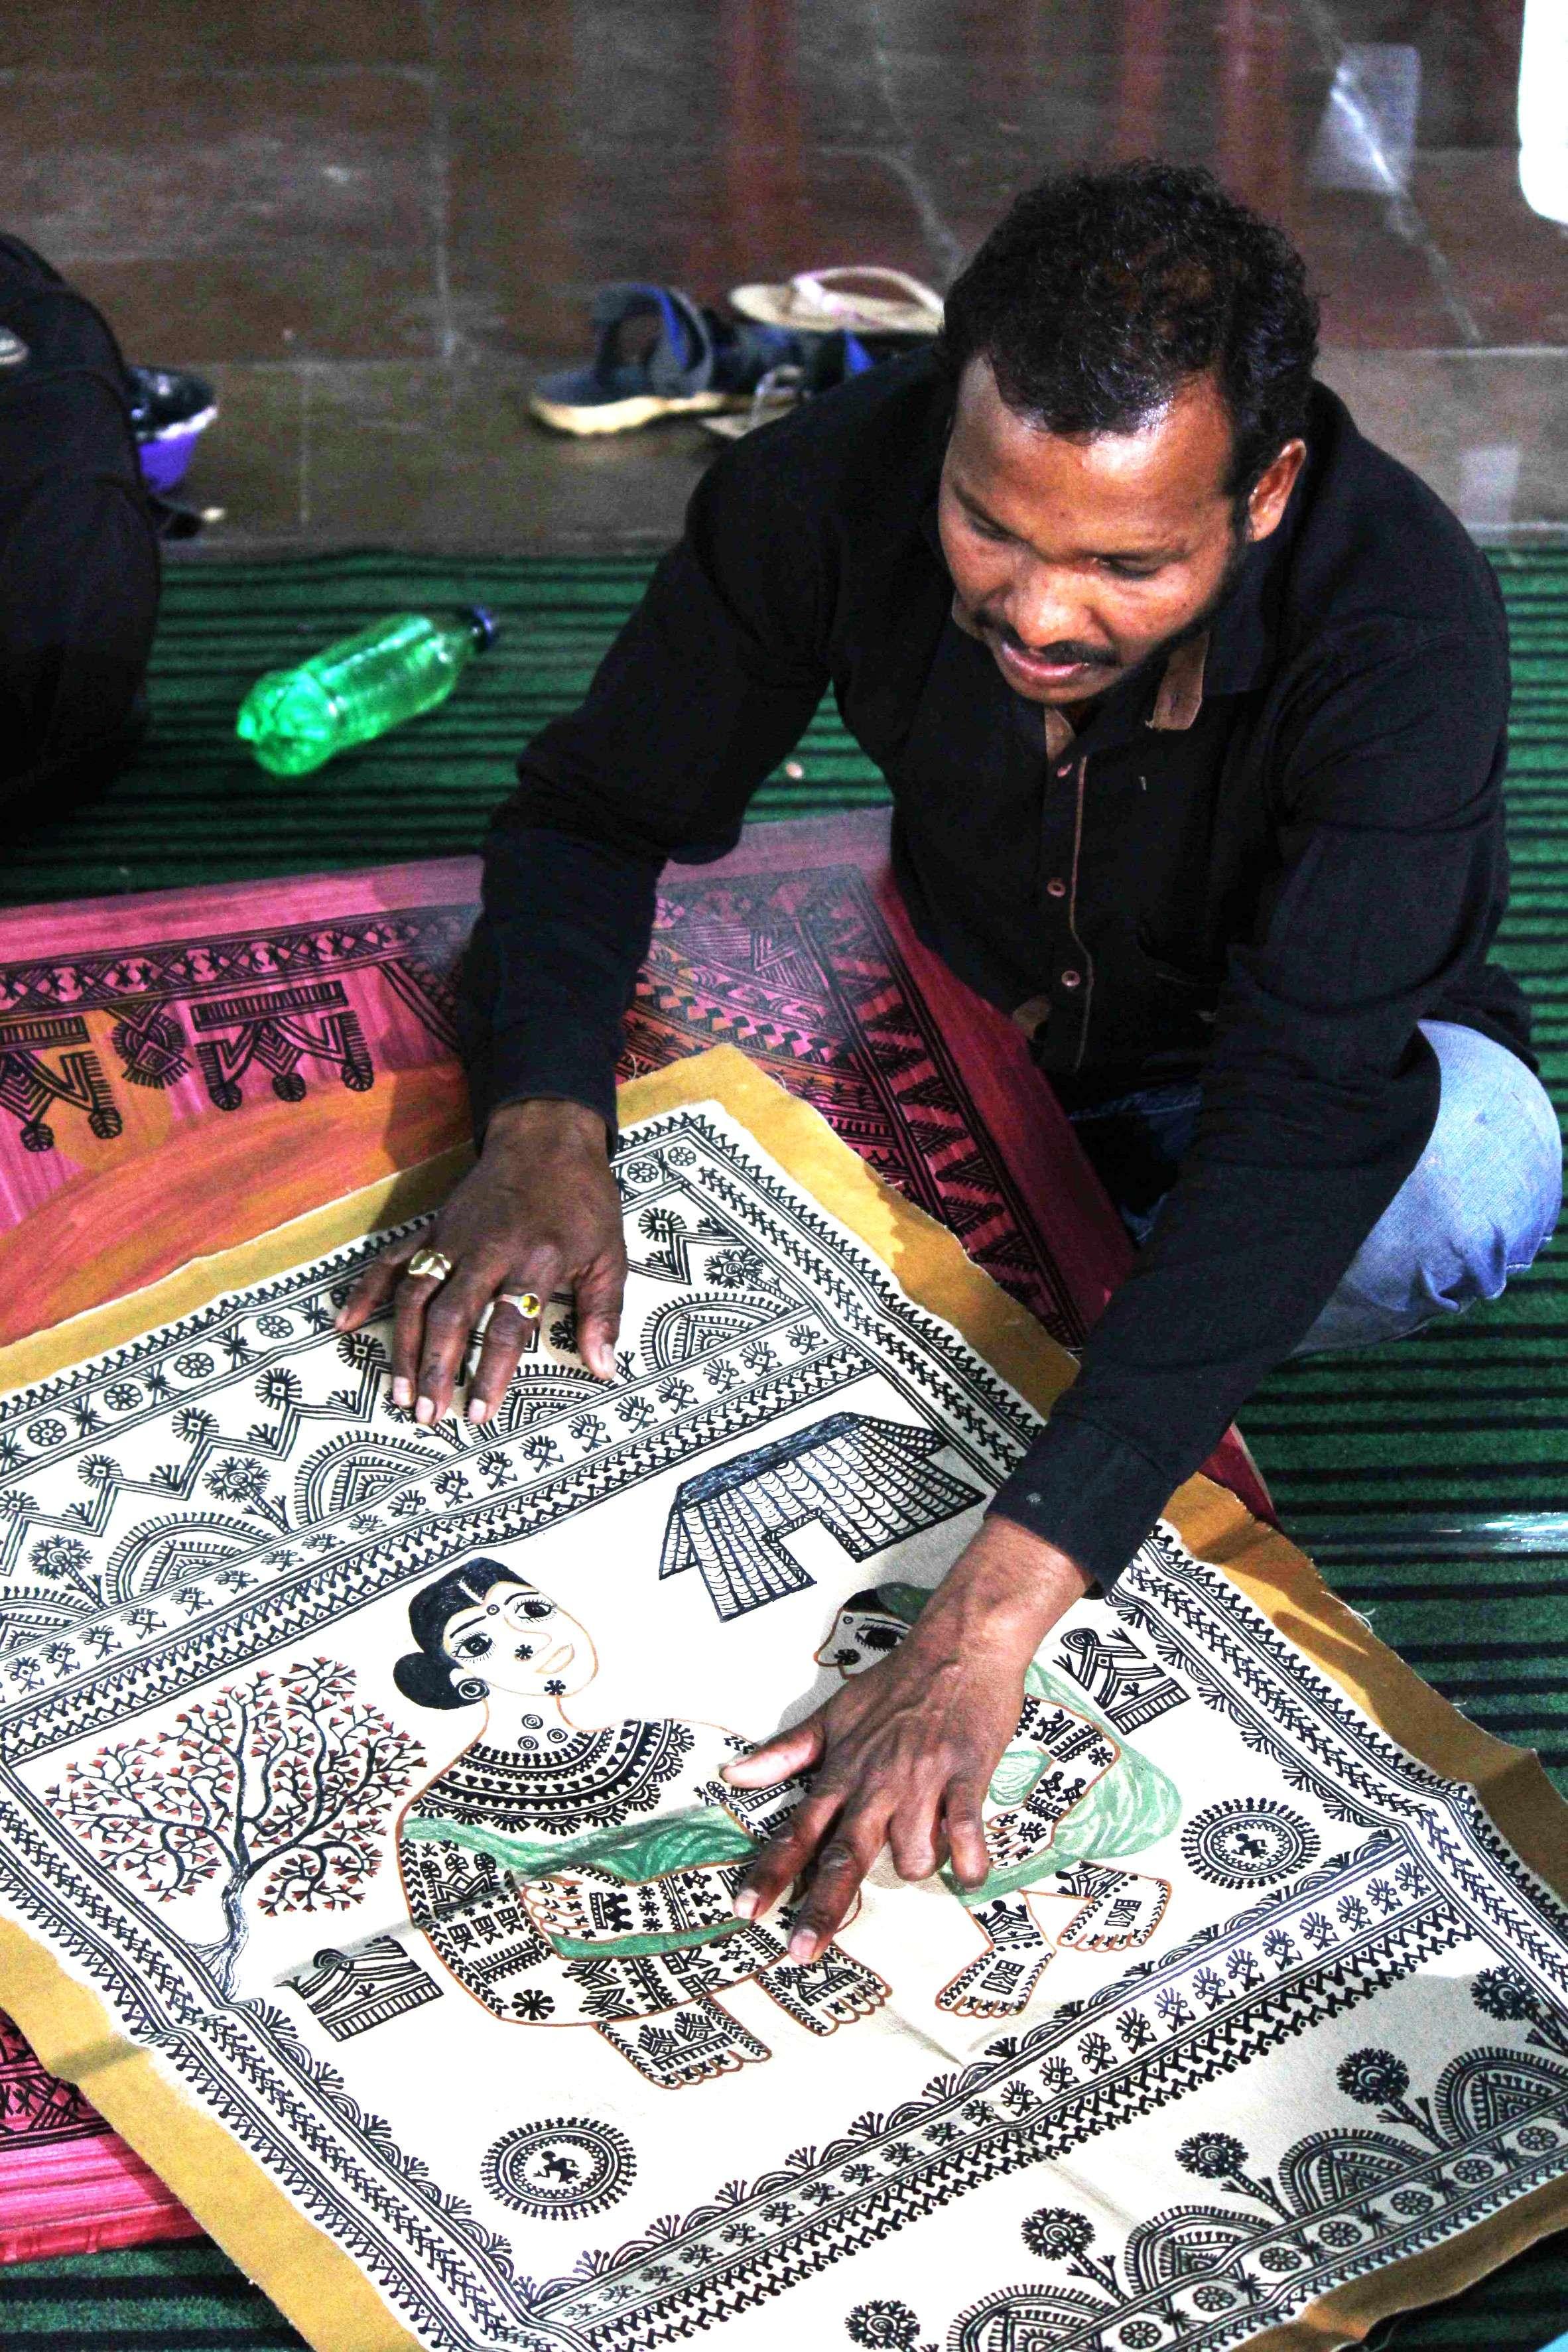 Bhaju paole shows the fabrics he has painted for sale